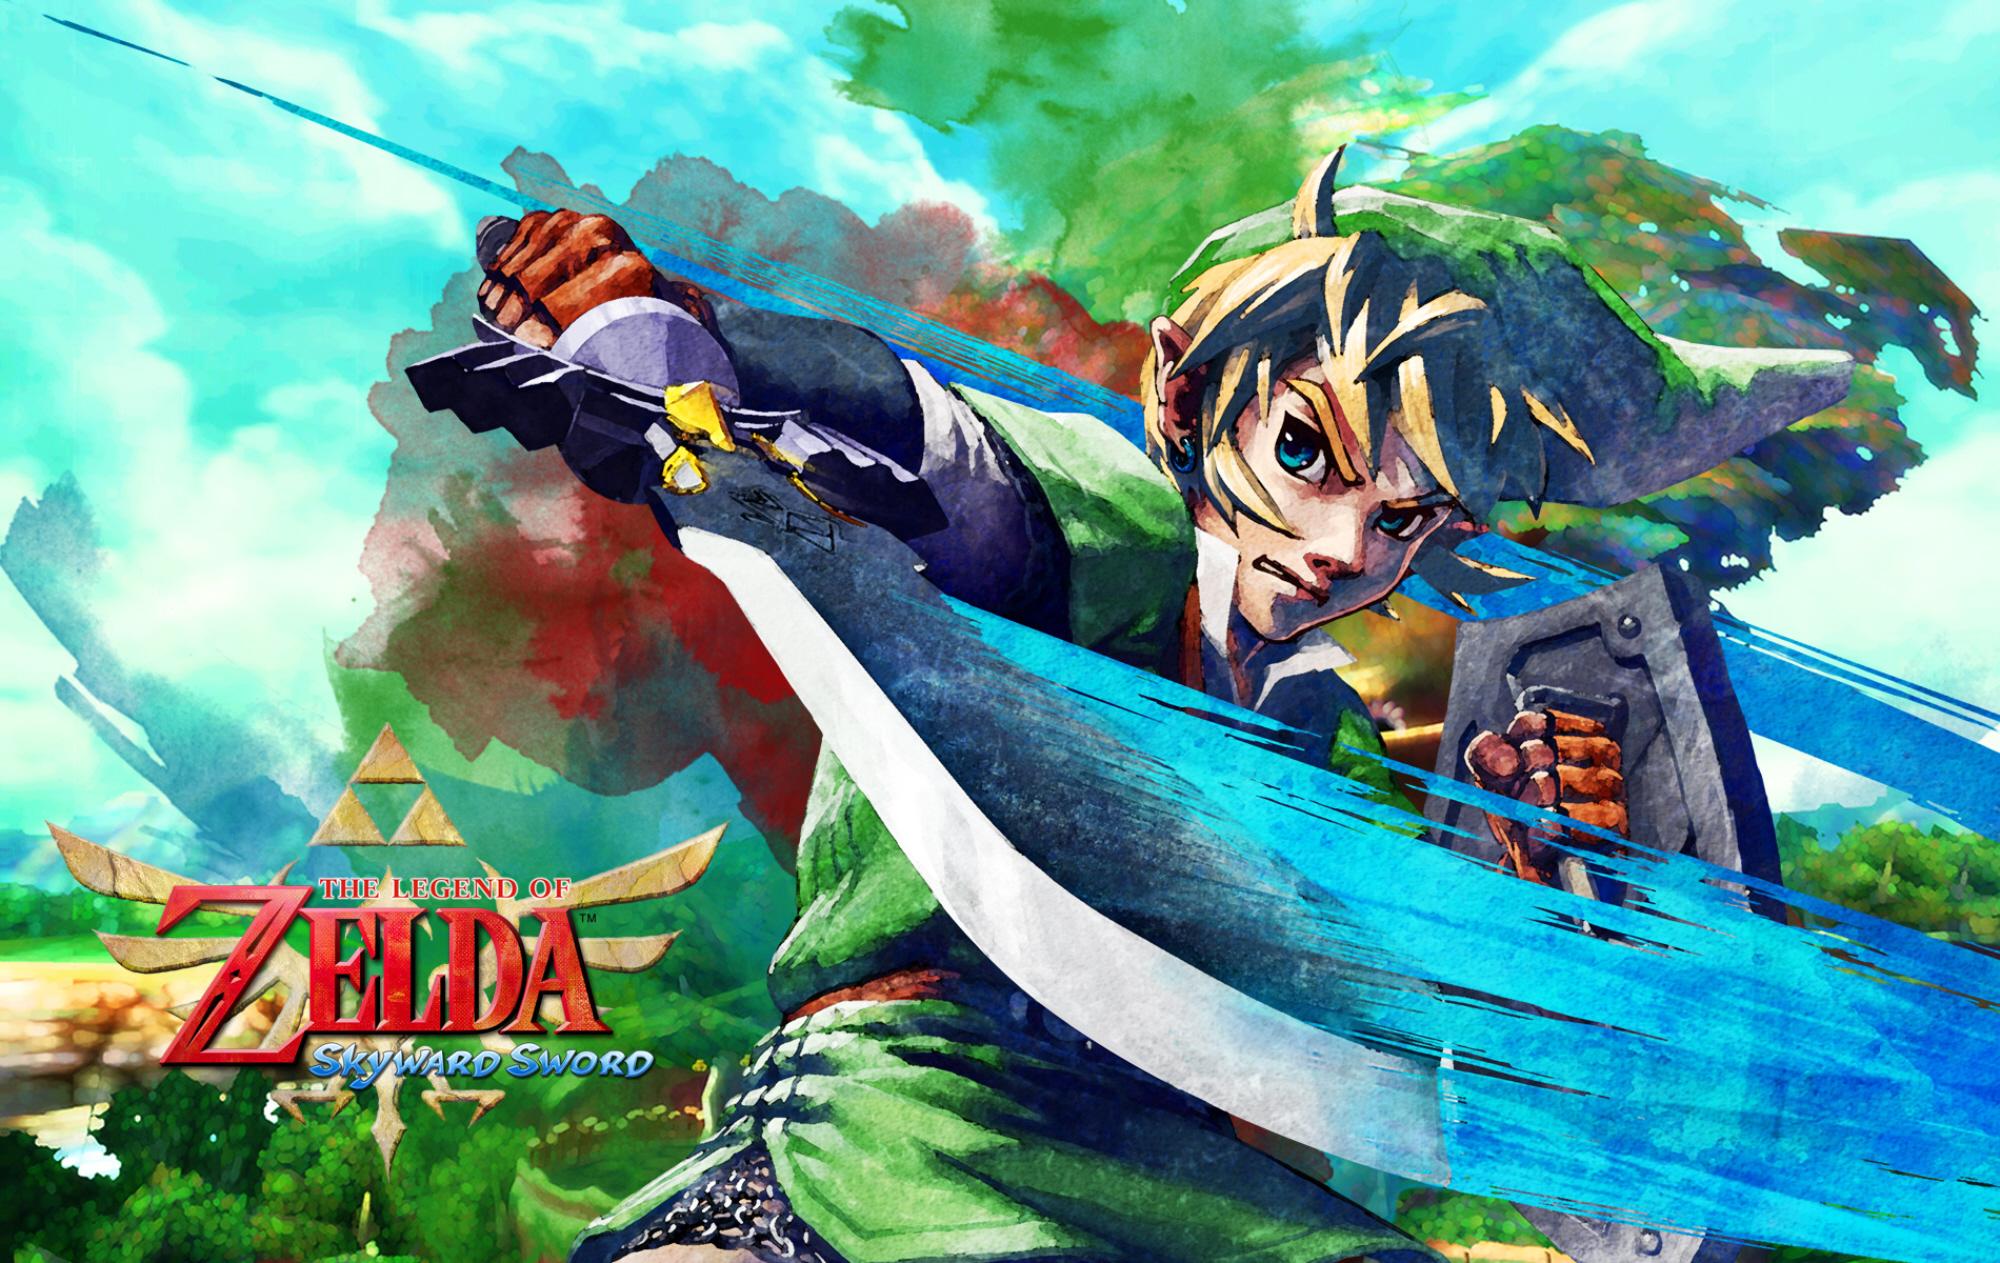 Zelda Skyward Sword Wallpaper Hd Video Games Blogger